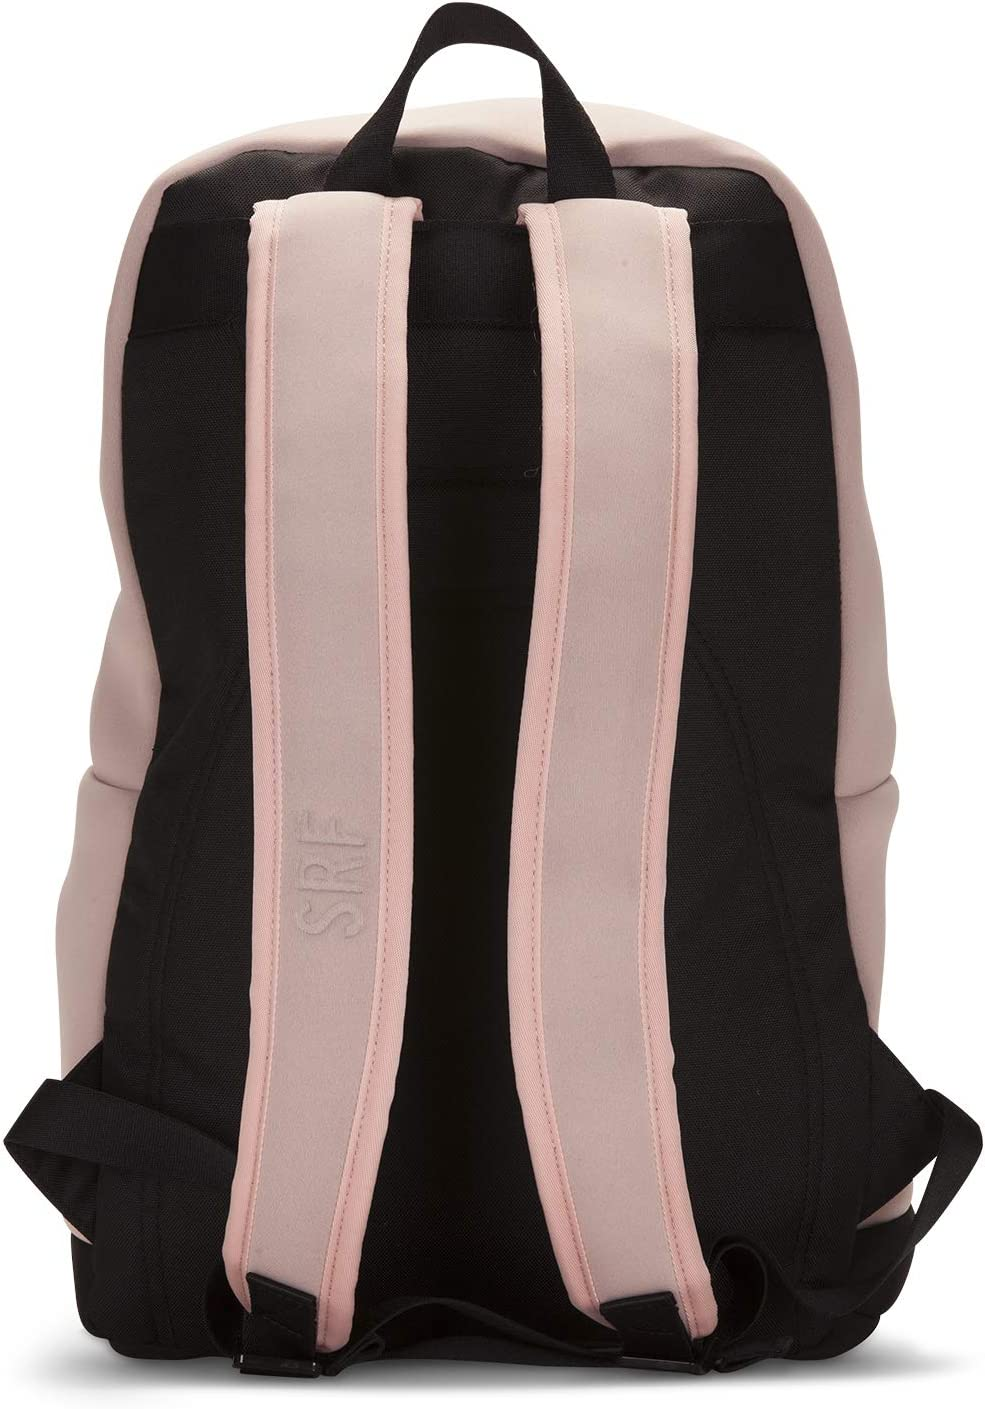 Storm Pink Hurley Unisex Neoprene Backpack One Size